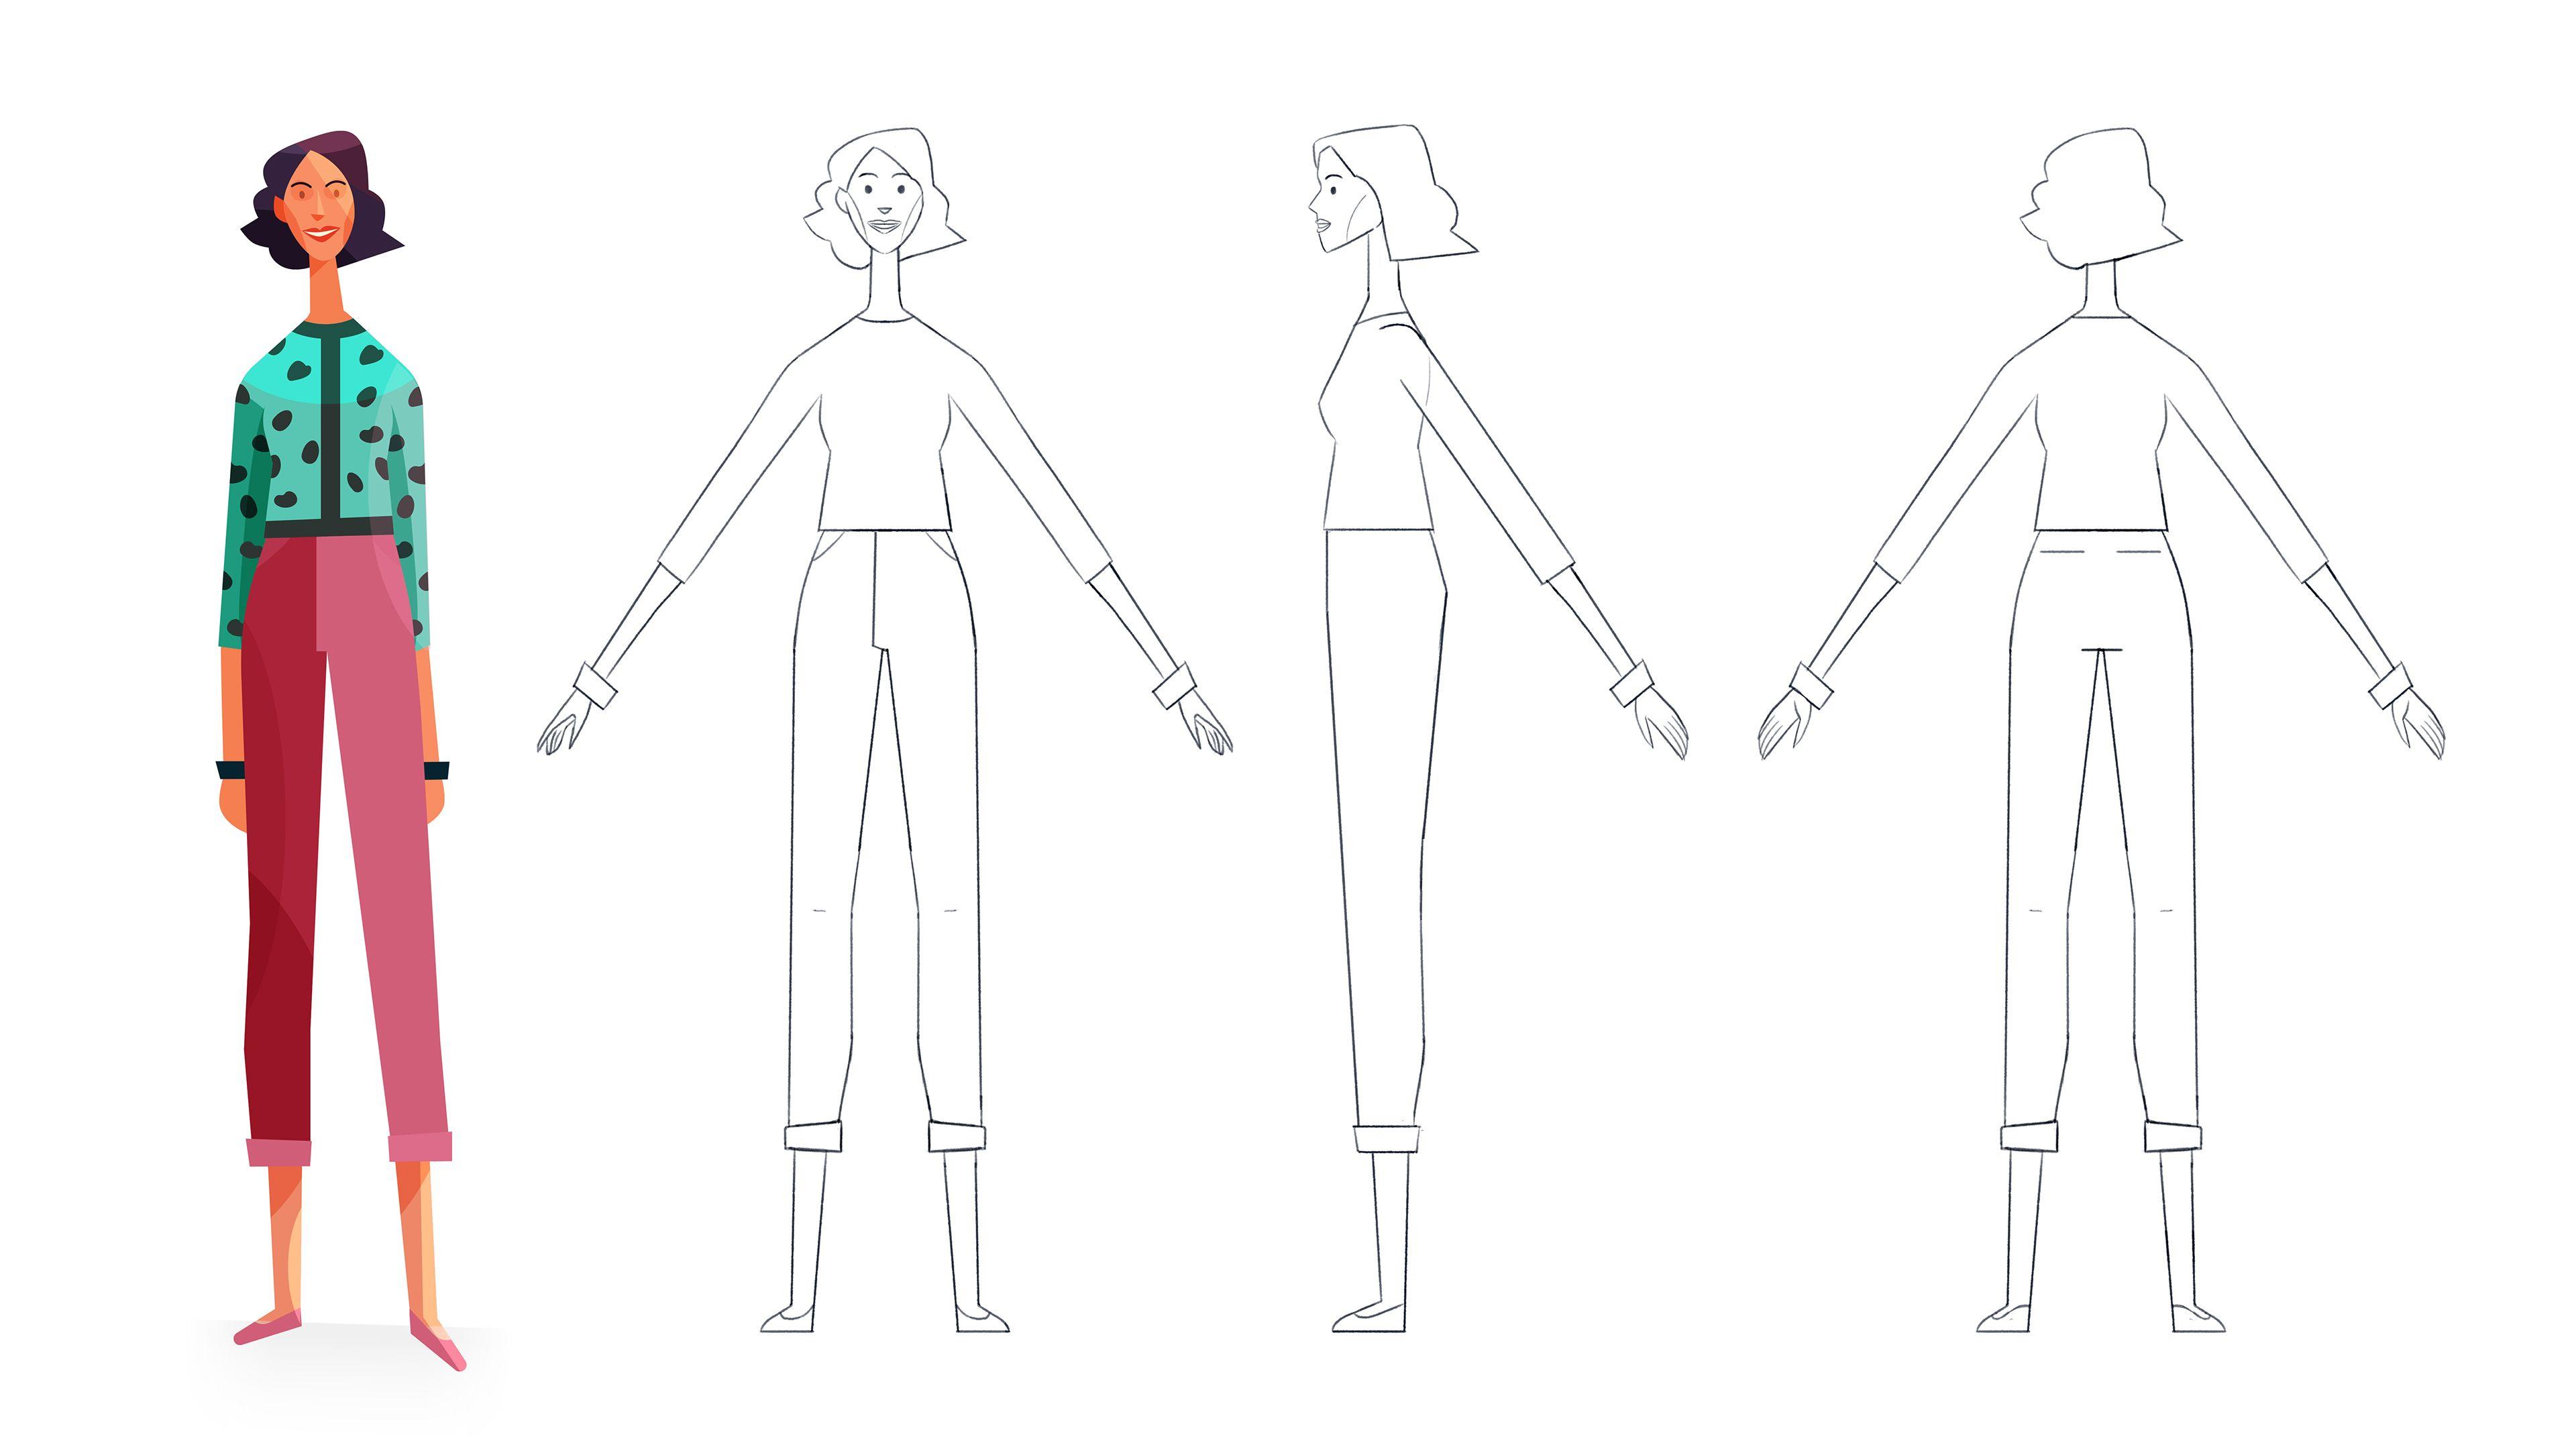 Kristian Duffy Character Design Woman Character Design Design Portfolio Design,Beach Interior Design Style